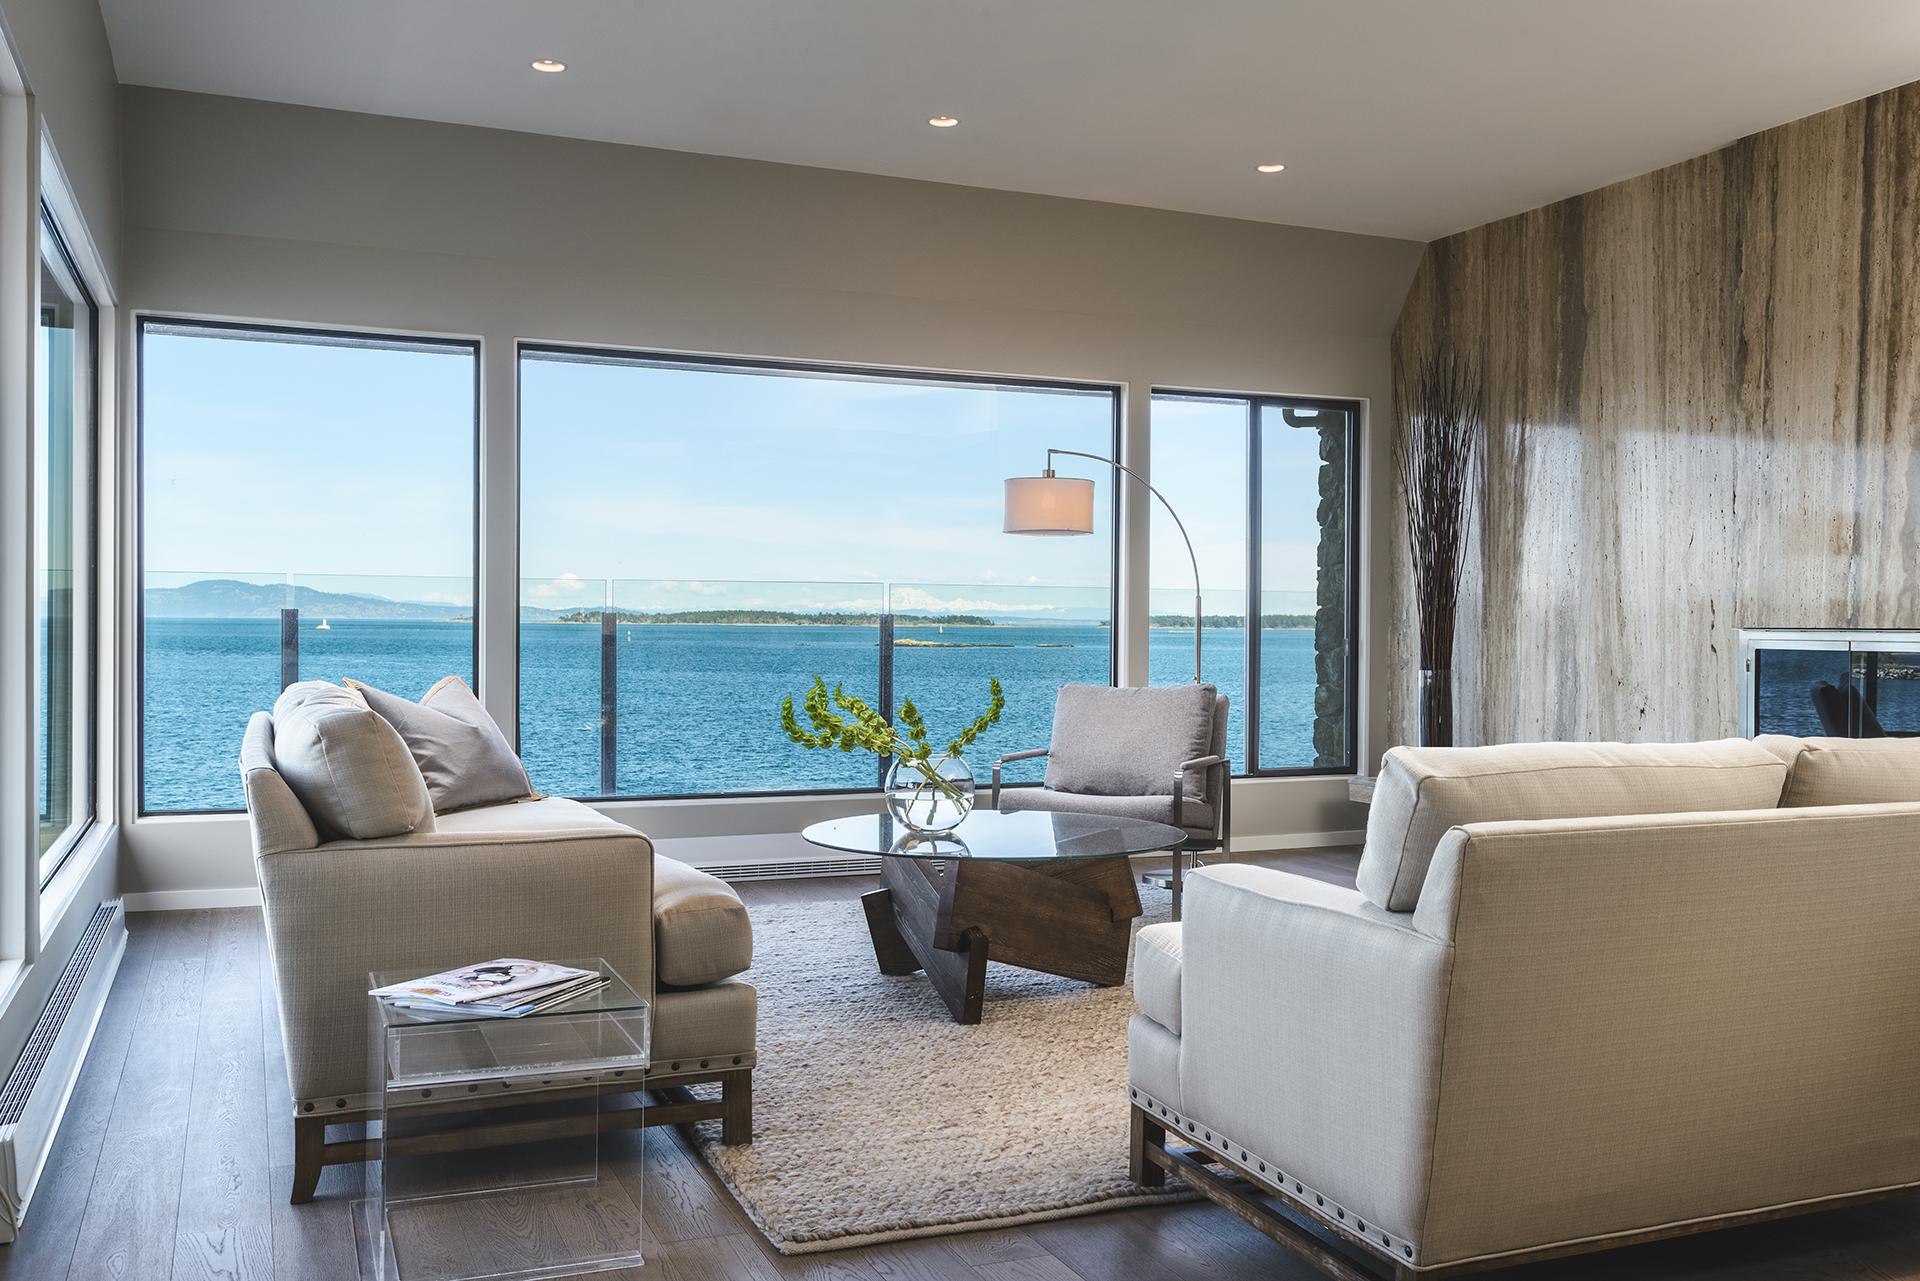 Condo Reno In Oak Bay Celebrates Ocean View Modern Home